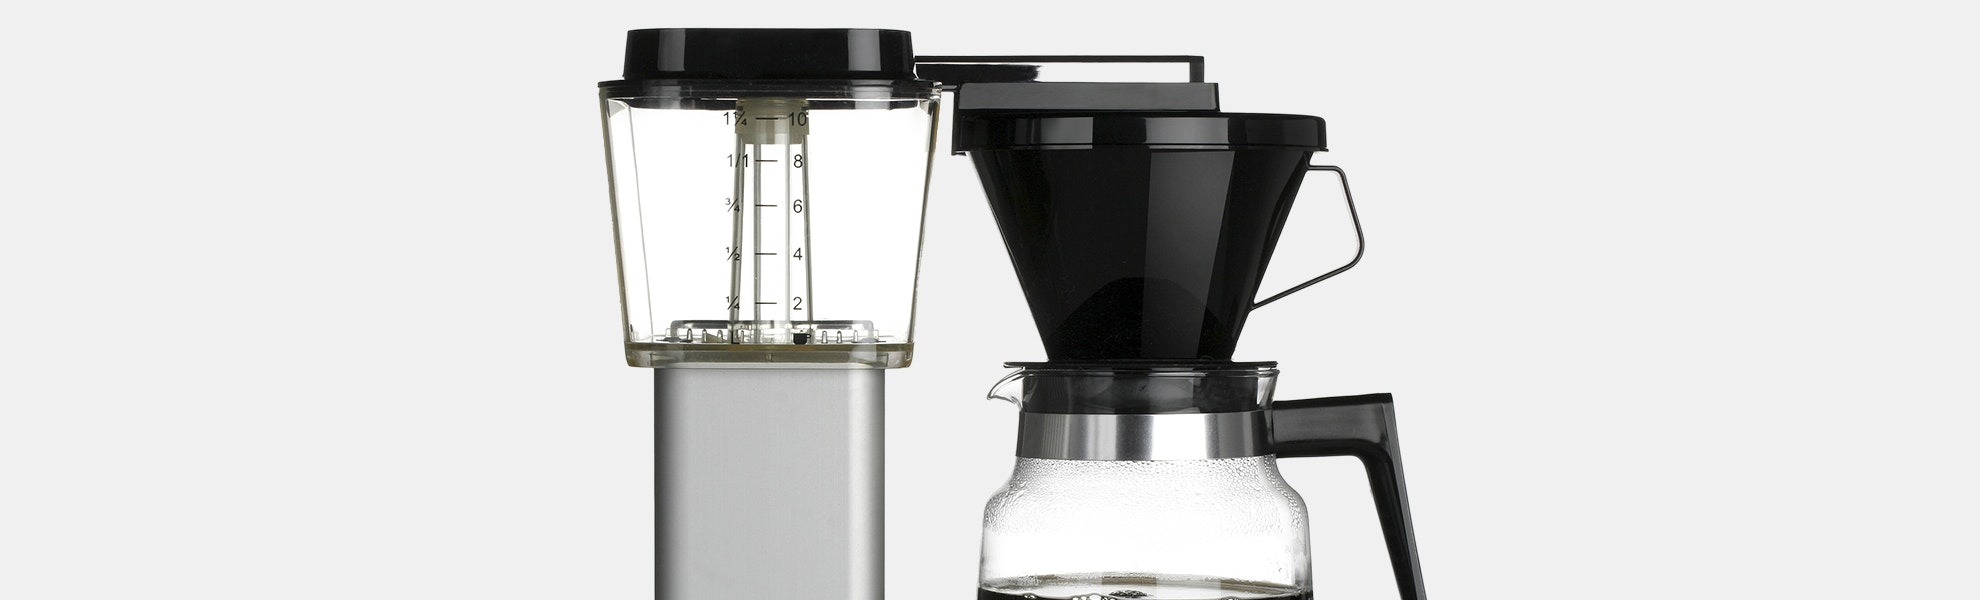 Technivorm Moccamaster K741 Coffee Brewer